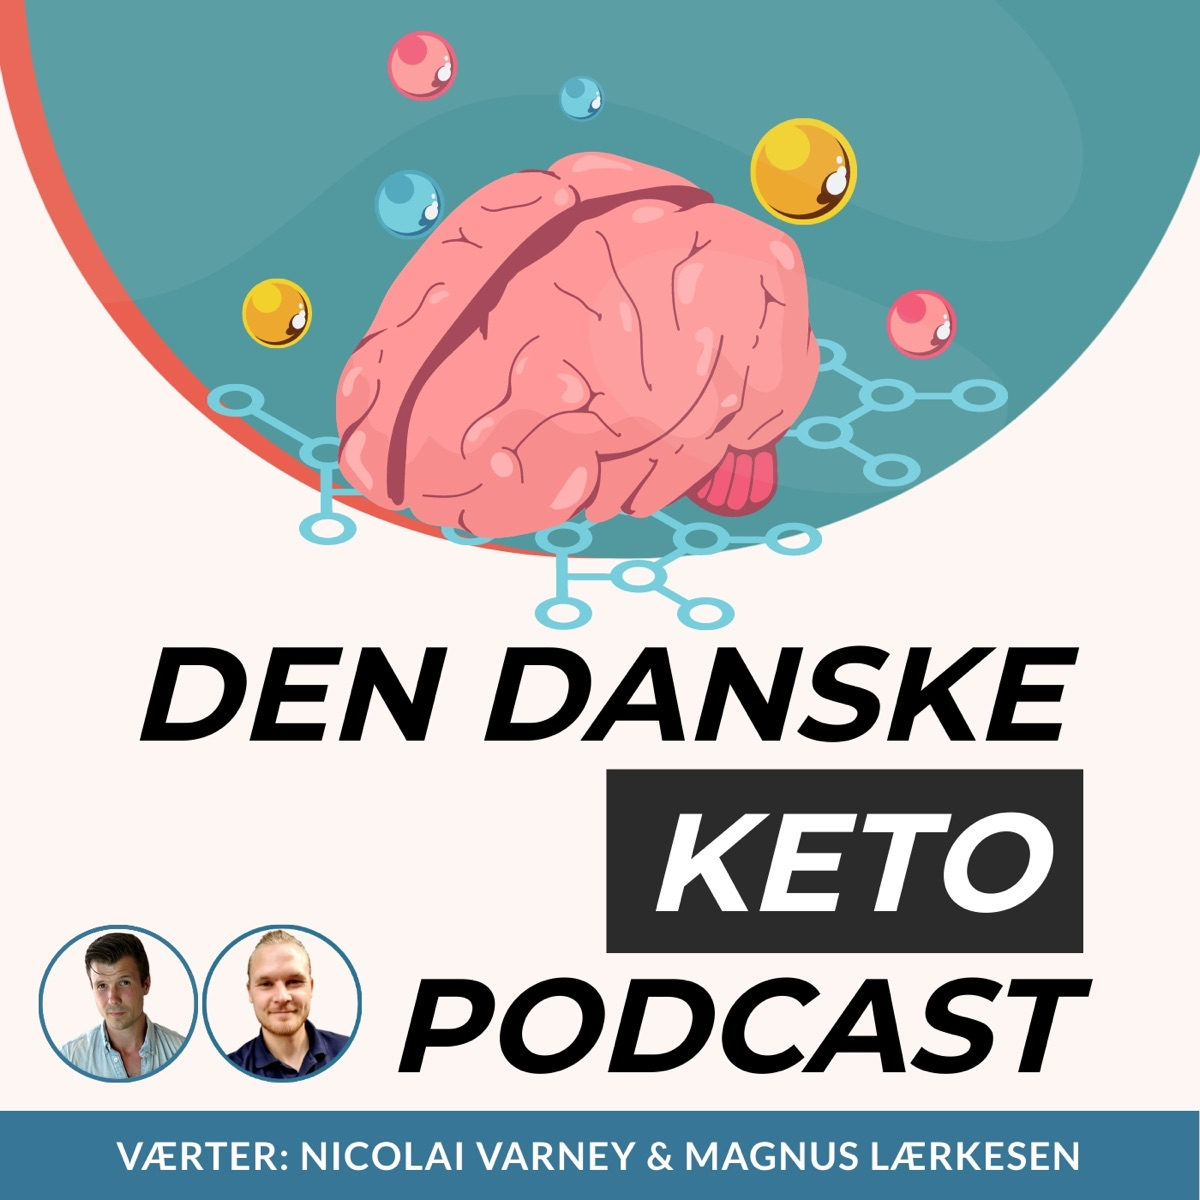 Den danske Keto podcast